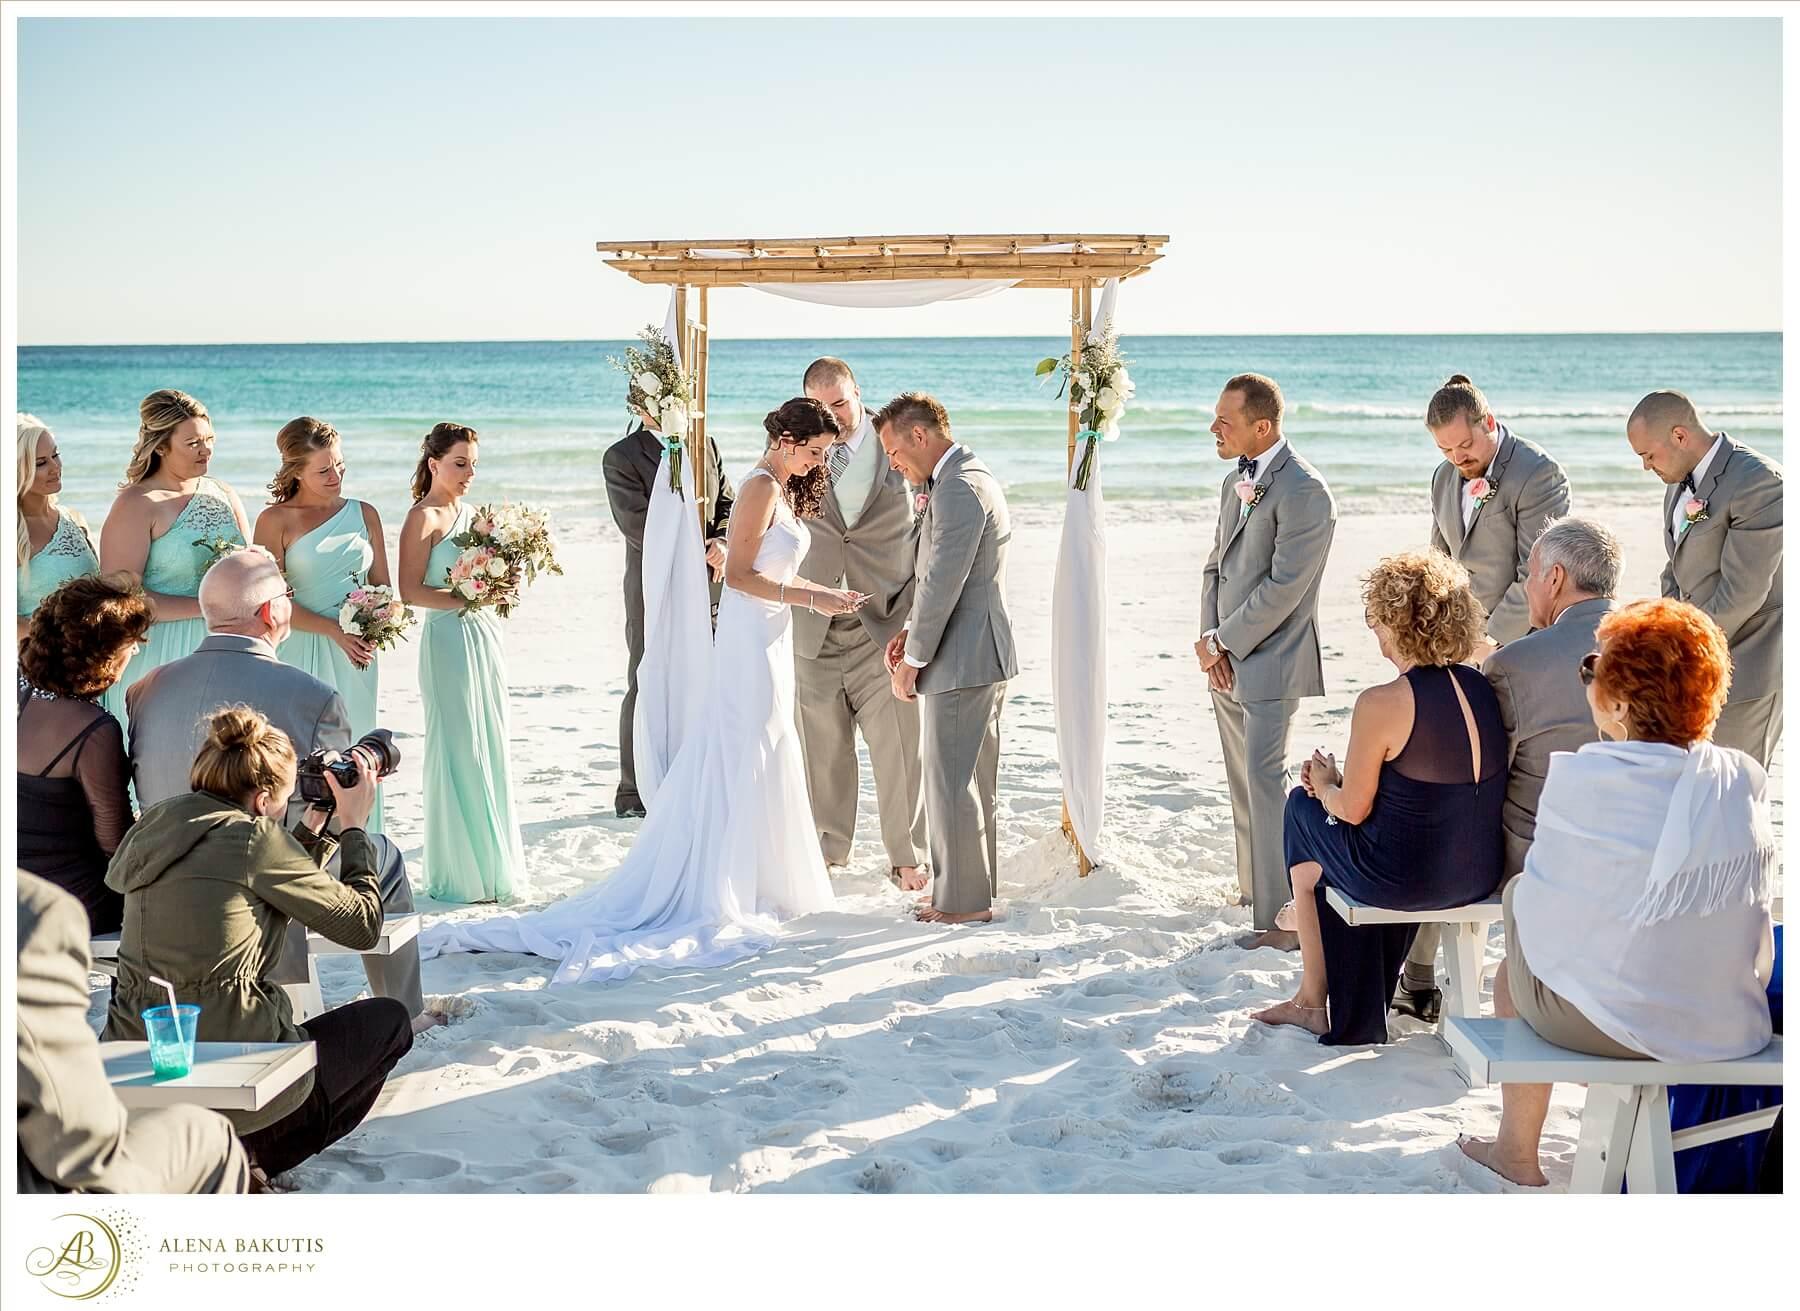 destin beach weddings Alena Bakutis Photography - Amber Brandon-369_WEB